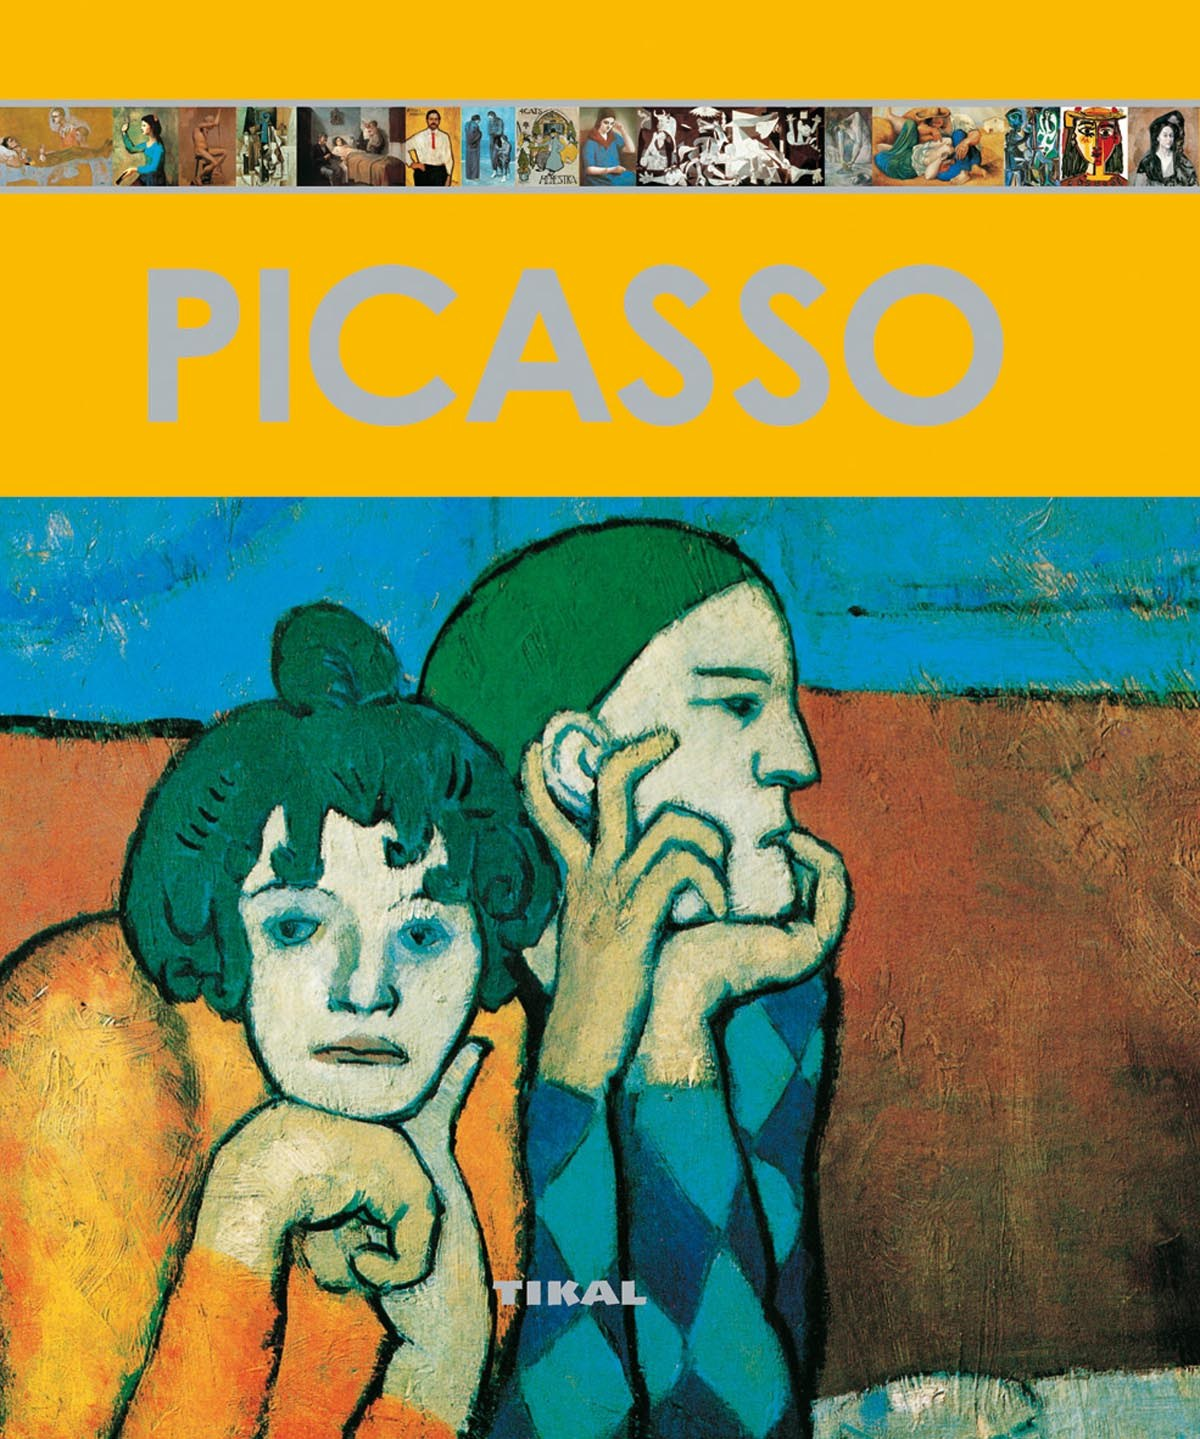 Picasso 9788499280264